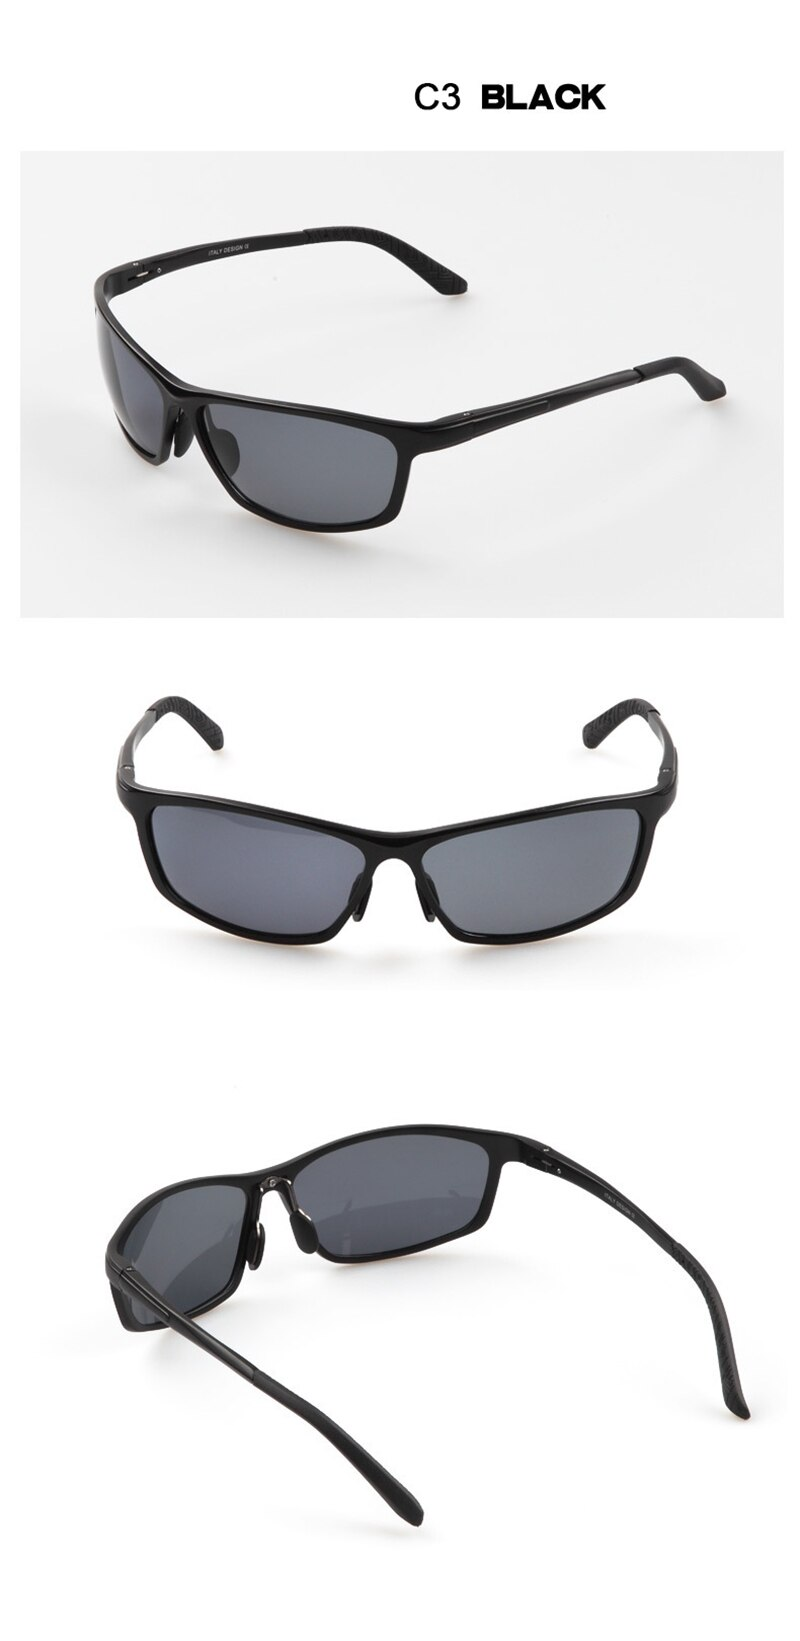 OLEY Brand Designer Aluminum magnesium Men's Polarized Sunglasses male driving Eyewear Accessories Sun Glasses Goggles